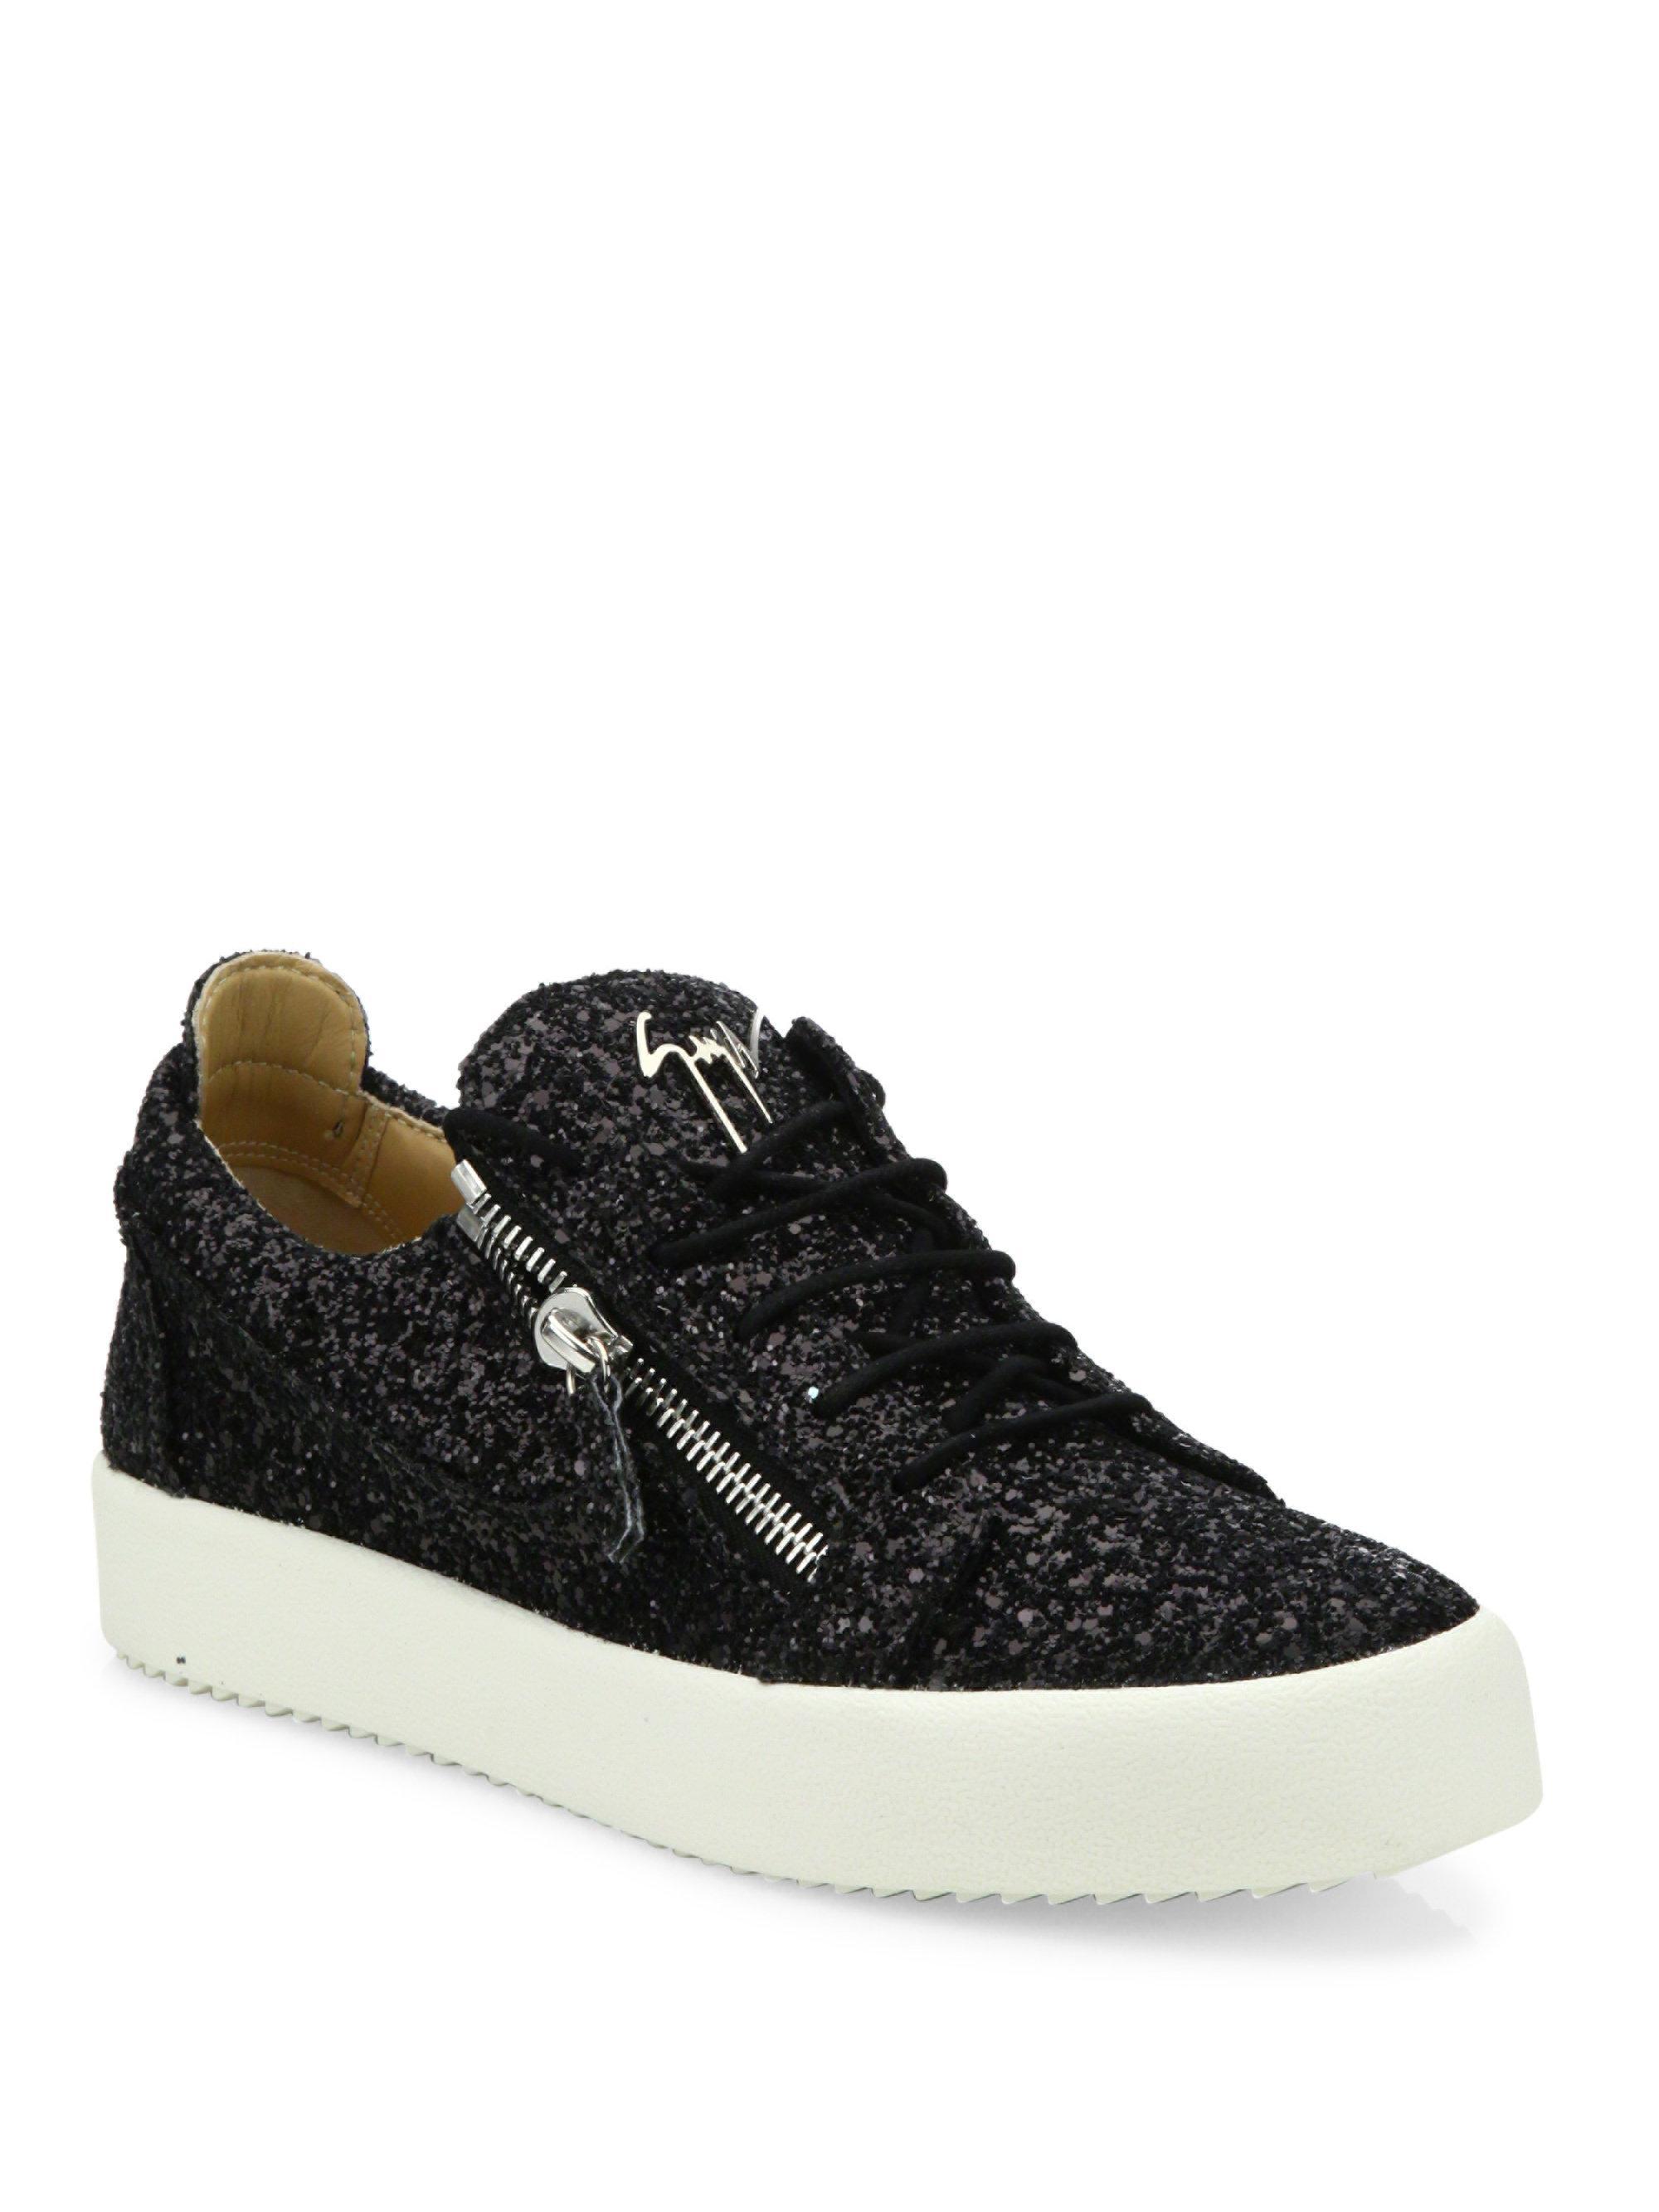 Lyst - Giuseppe Zanotti Glitter Weaved Platform Sneakers